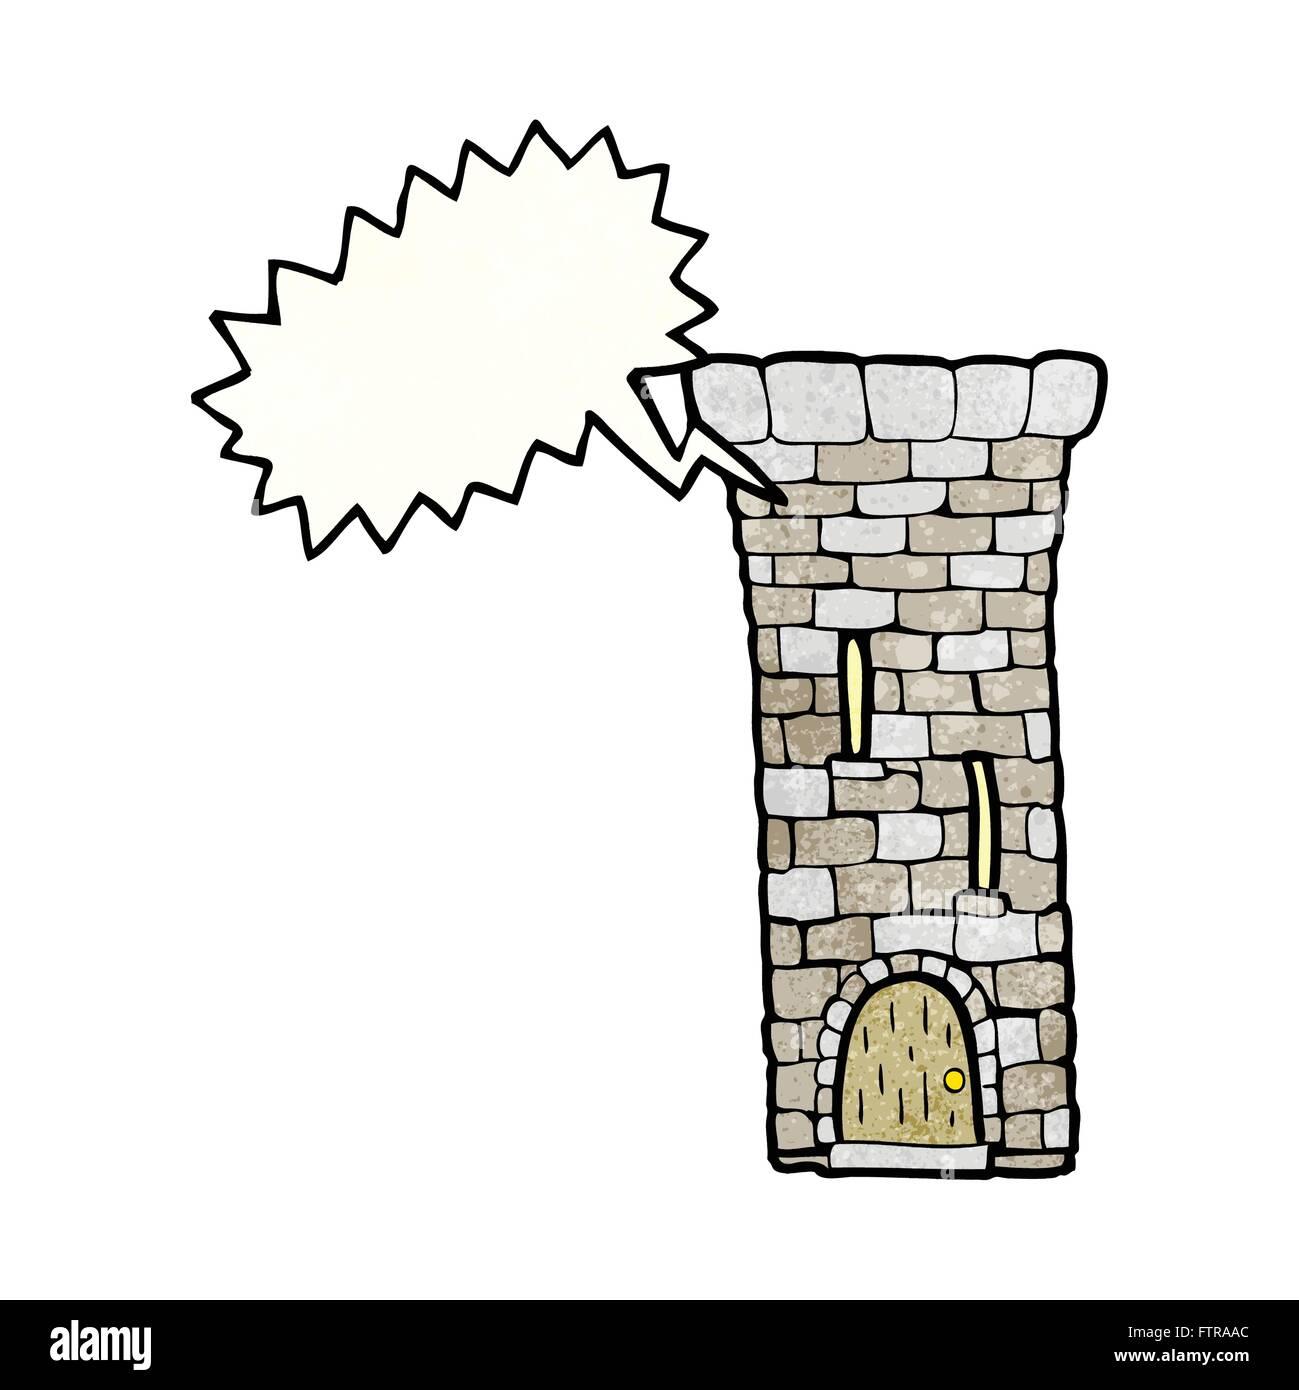 freehand speech bubble textured cartoon old castle tower FTRAAC freehand speech bubble textured cartoon old castle tower stock